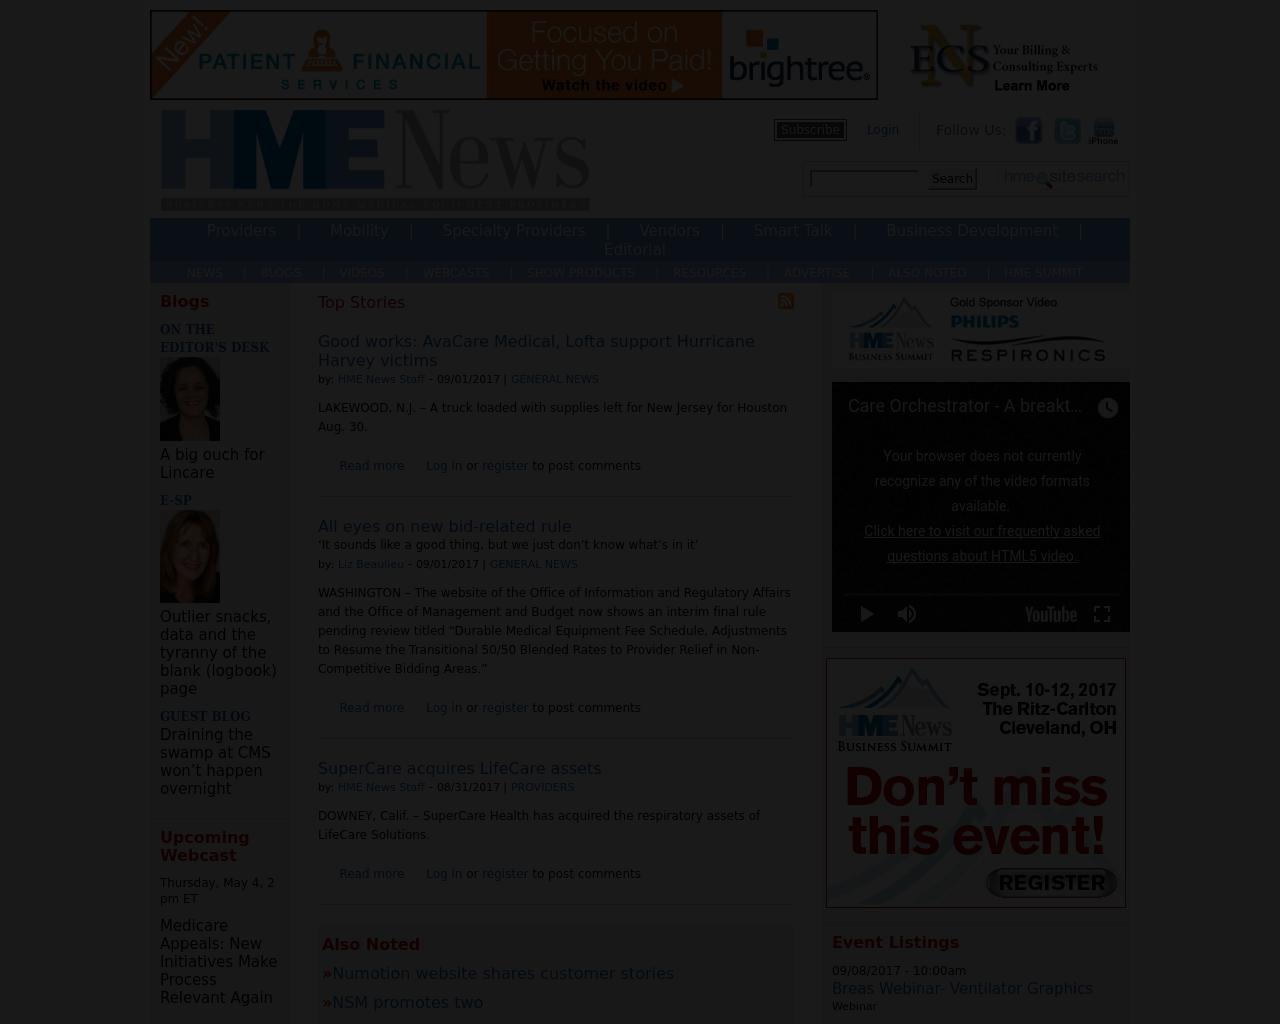 HME-News-Advertising-Reviews-Pricing